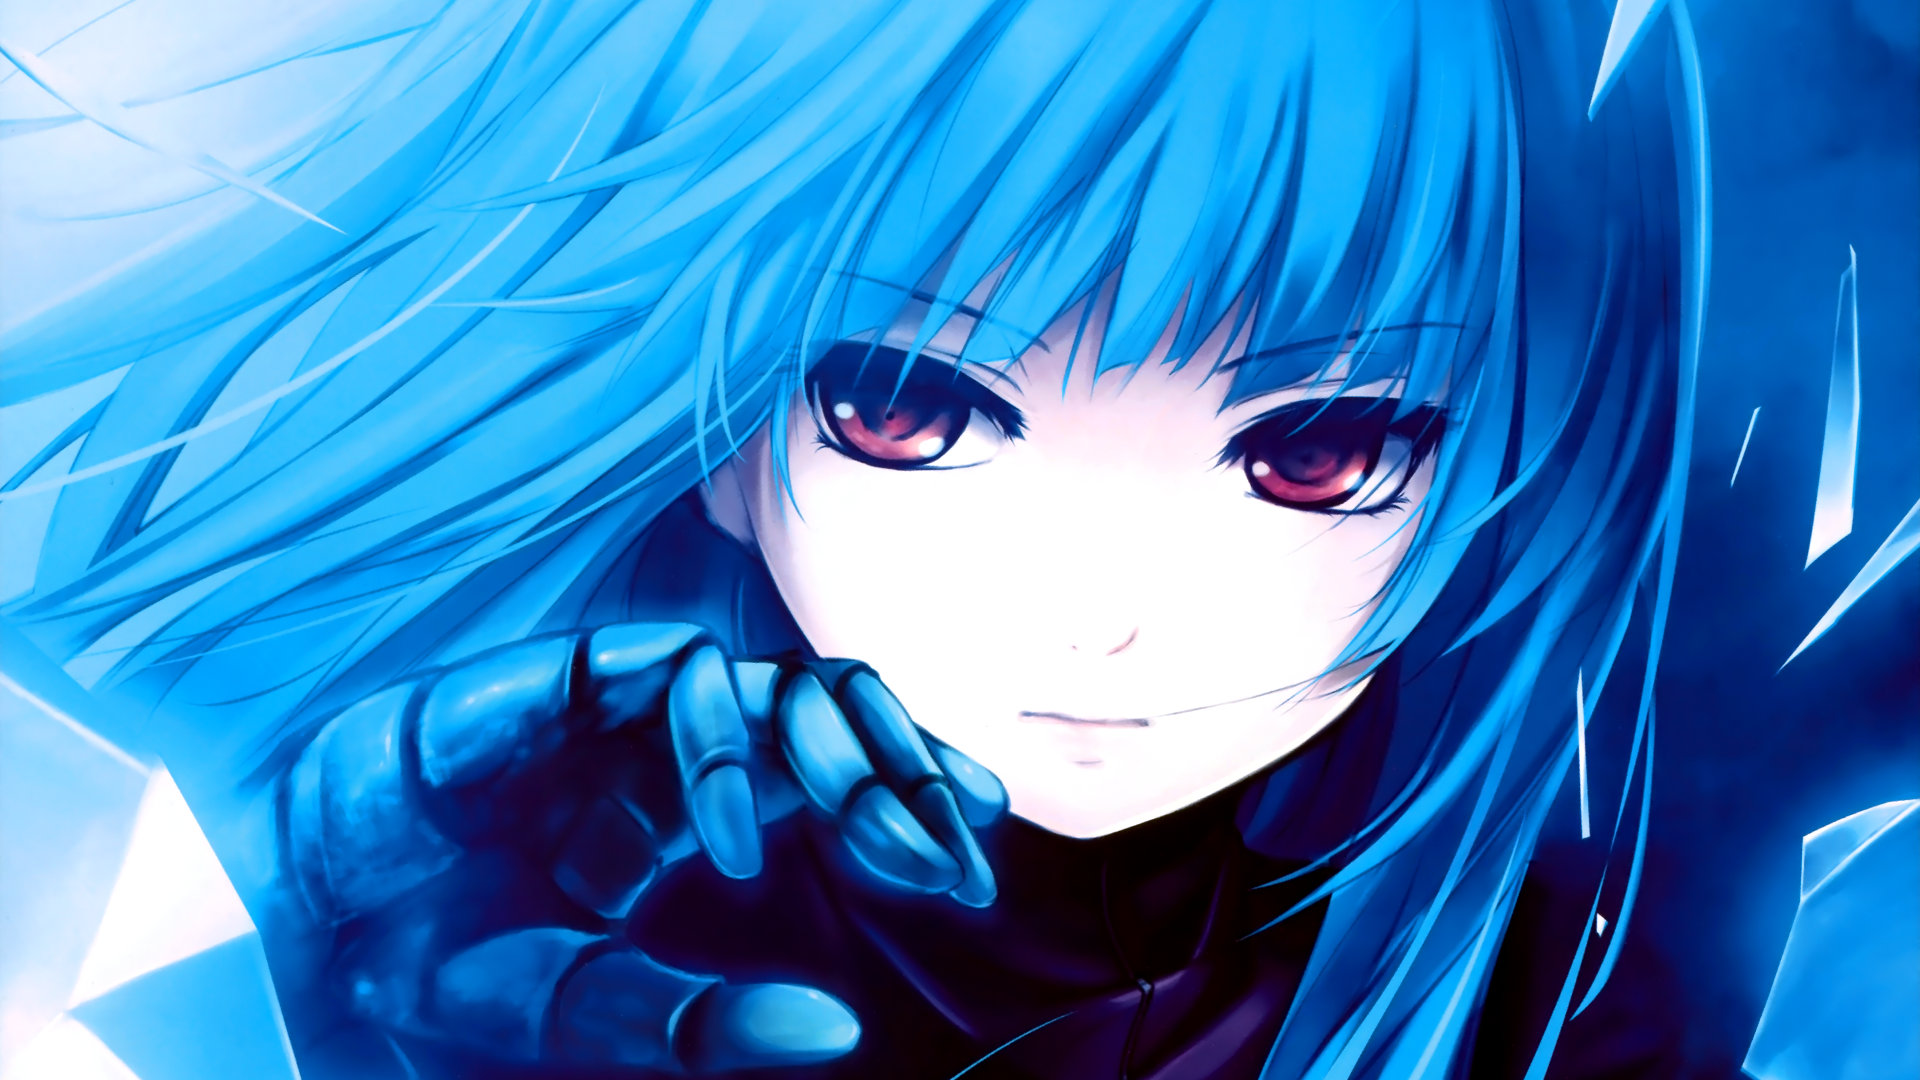 Anime Girls 2366